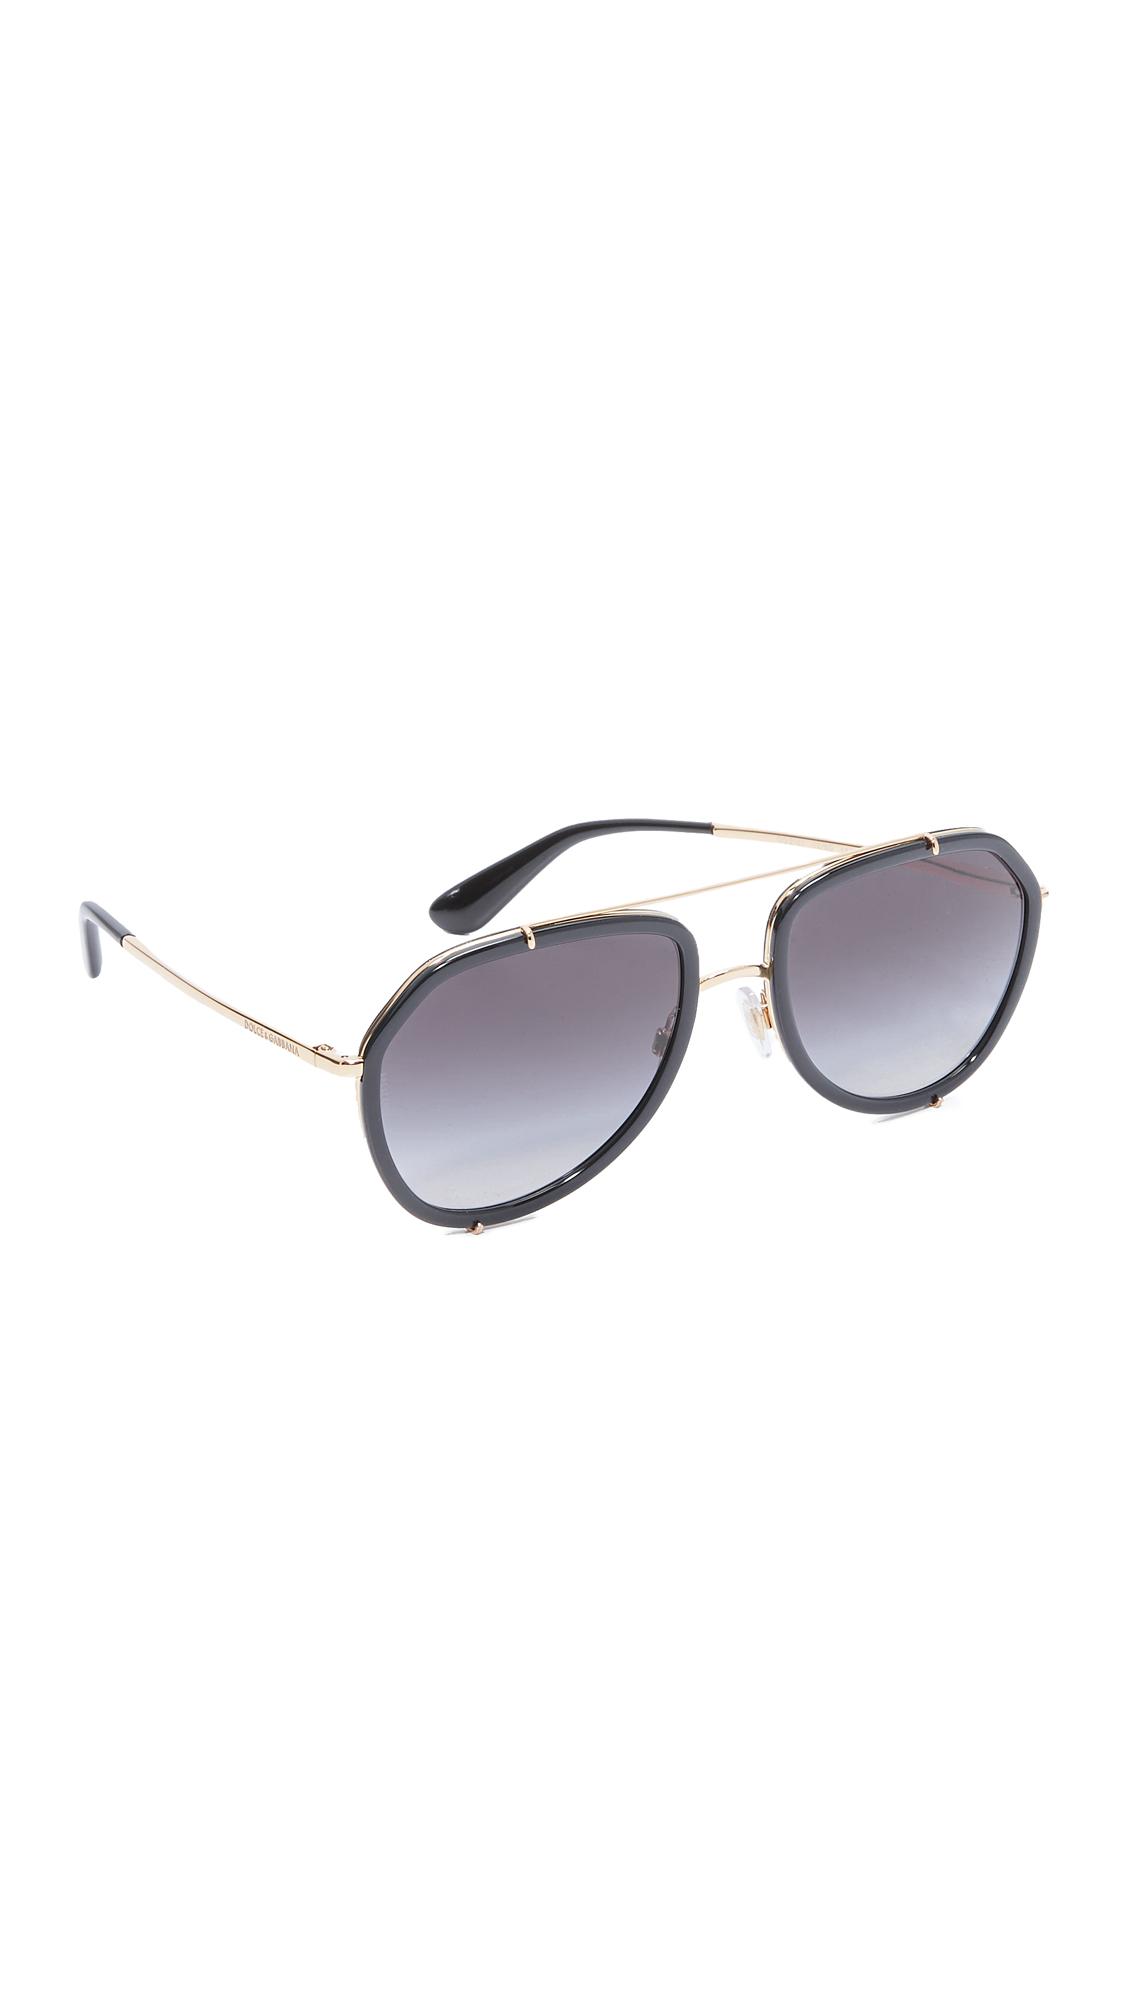 Dolce & Gabbana Aviator Sunglasses - Black/Grey at Shopbop